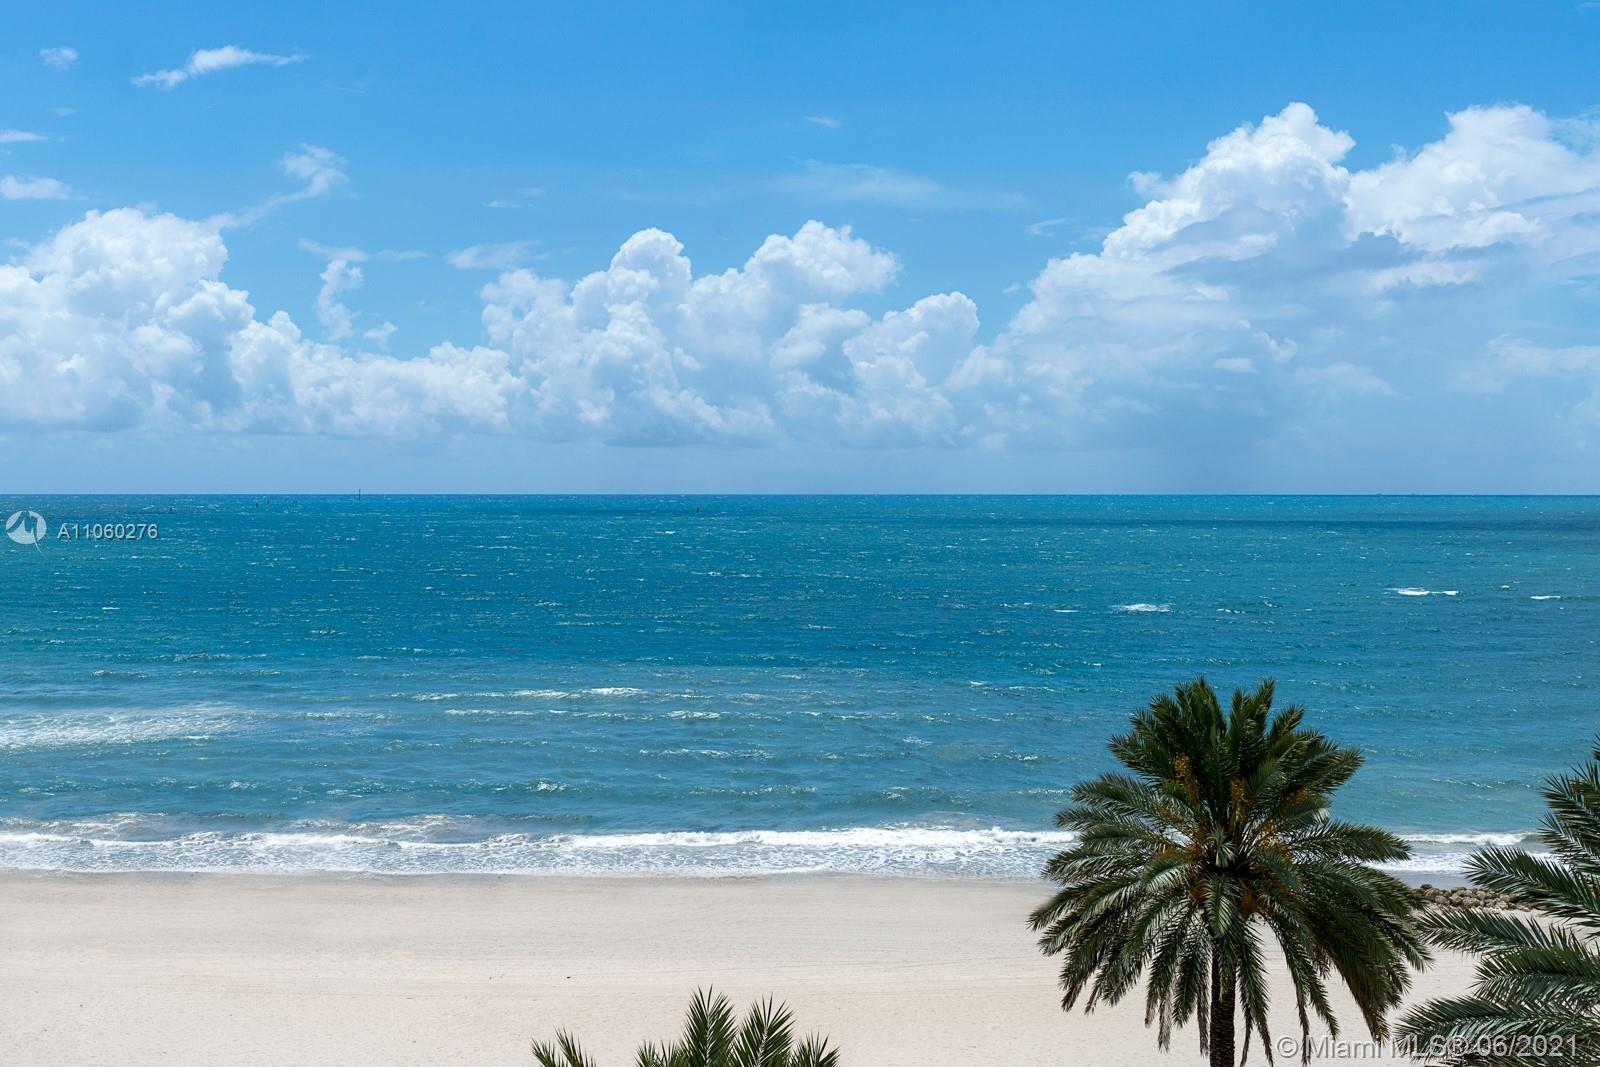 Photo of 7600 Fisher Island Dr #7653, Miami Beach, FL 33109 (MLS # A11060276)